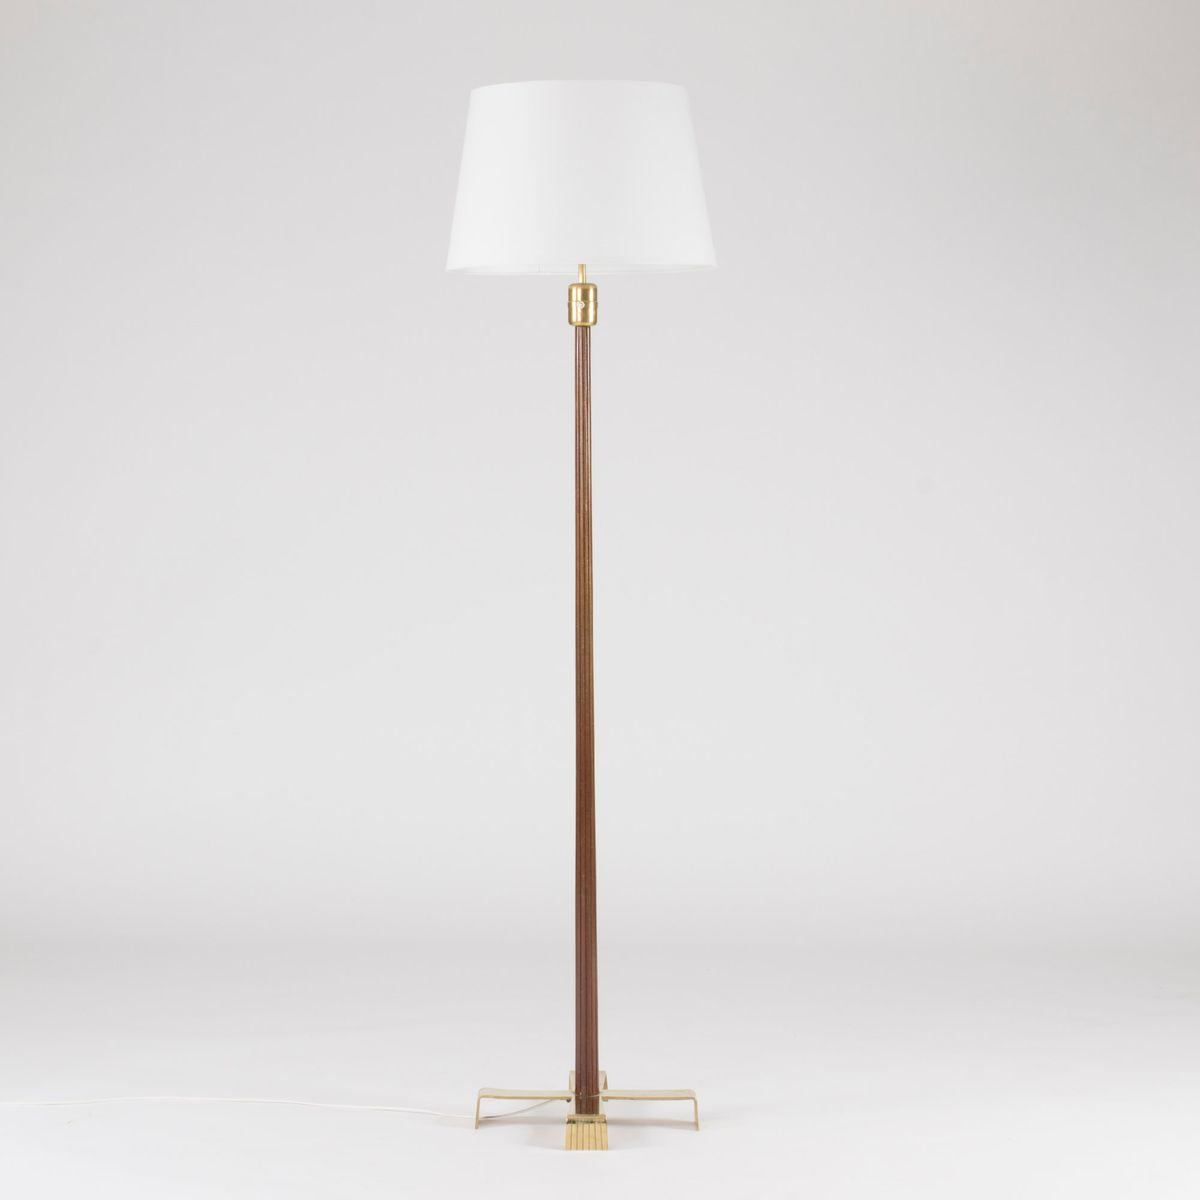 Mahogany floor lamp by hans bergstrm for atelji lyktan 1950s mahogany floor lamp by hans bergstrm for atelji lyktan 1950s geotapseo Choice Image